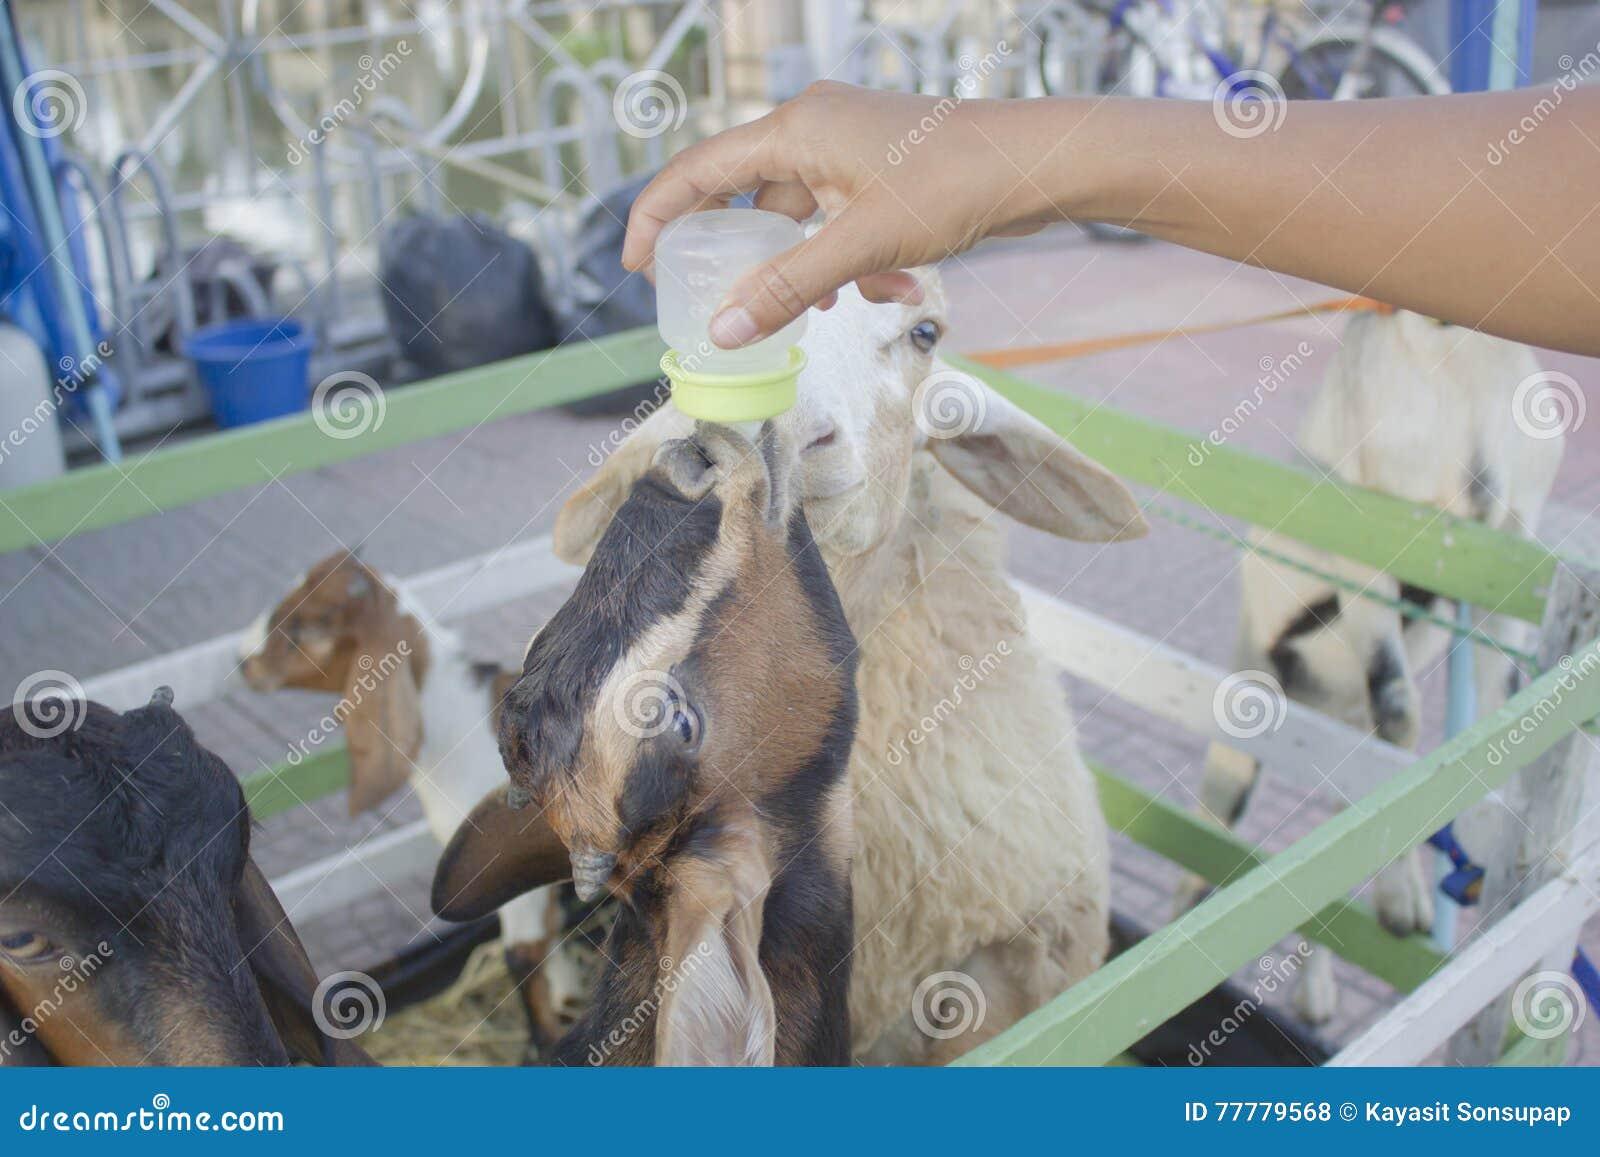 Raising milk goats stock photo  Image of adult, nurture